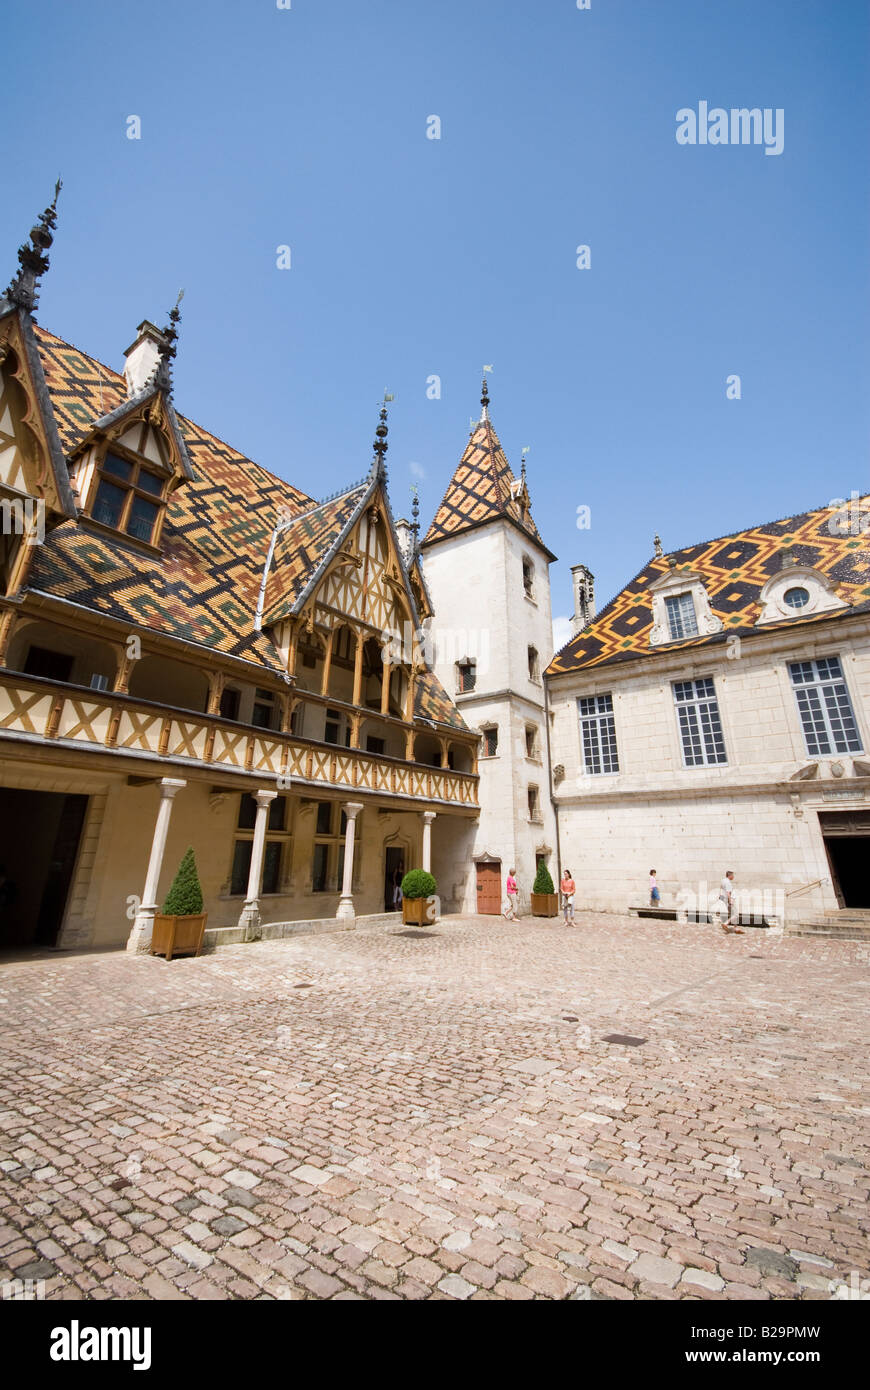 Hôtel-Dieu - Stock Image